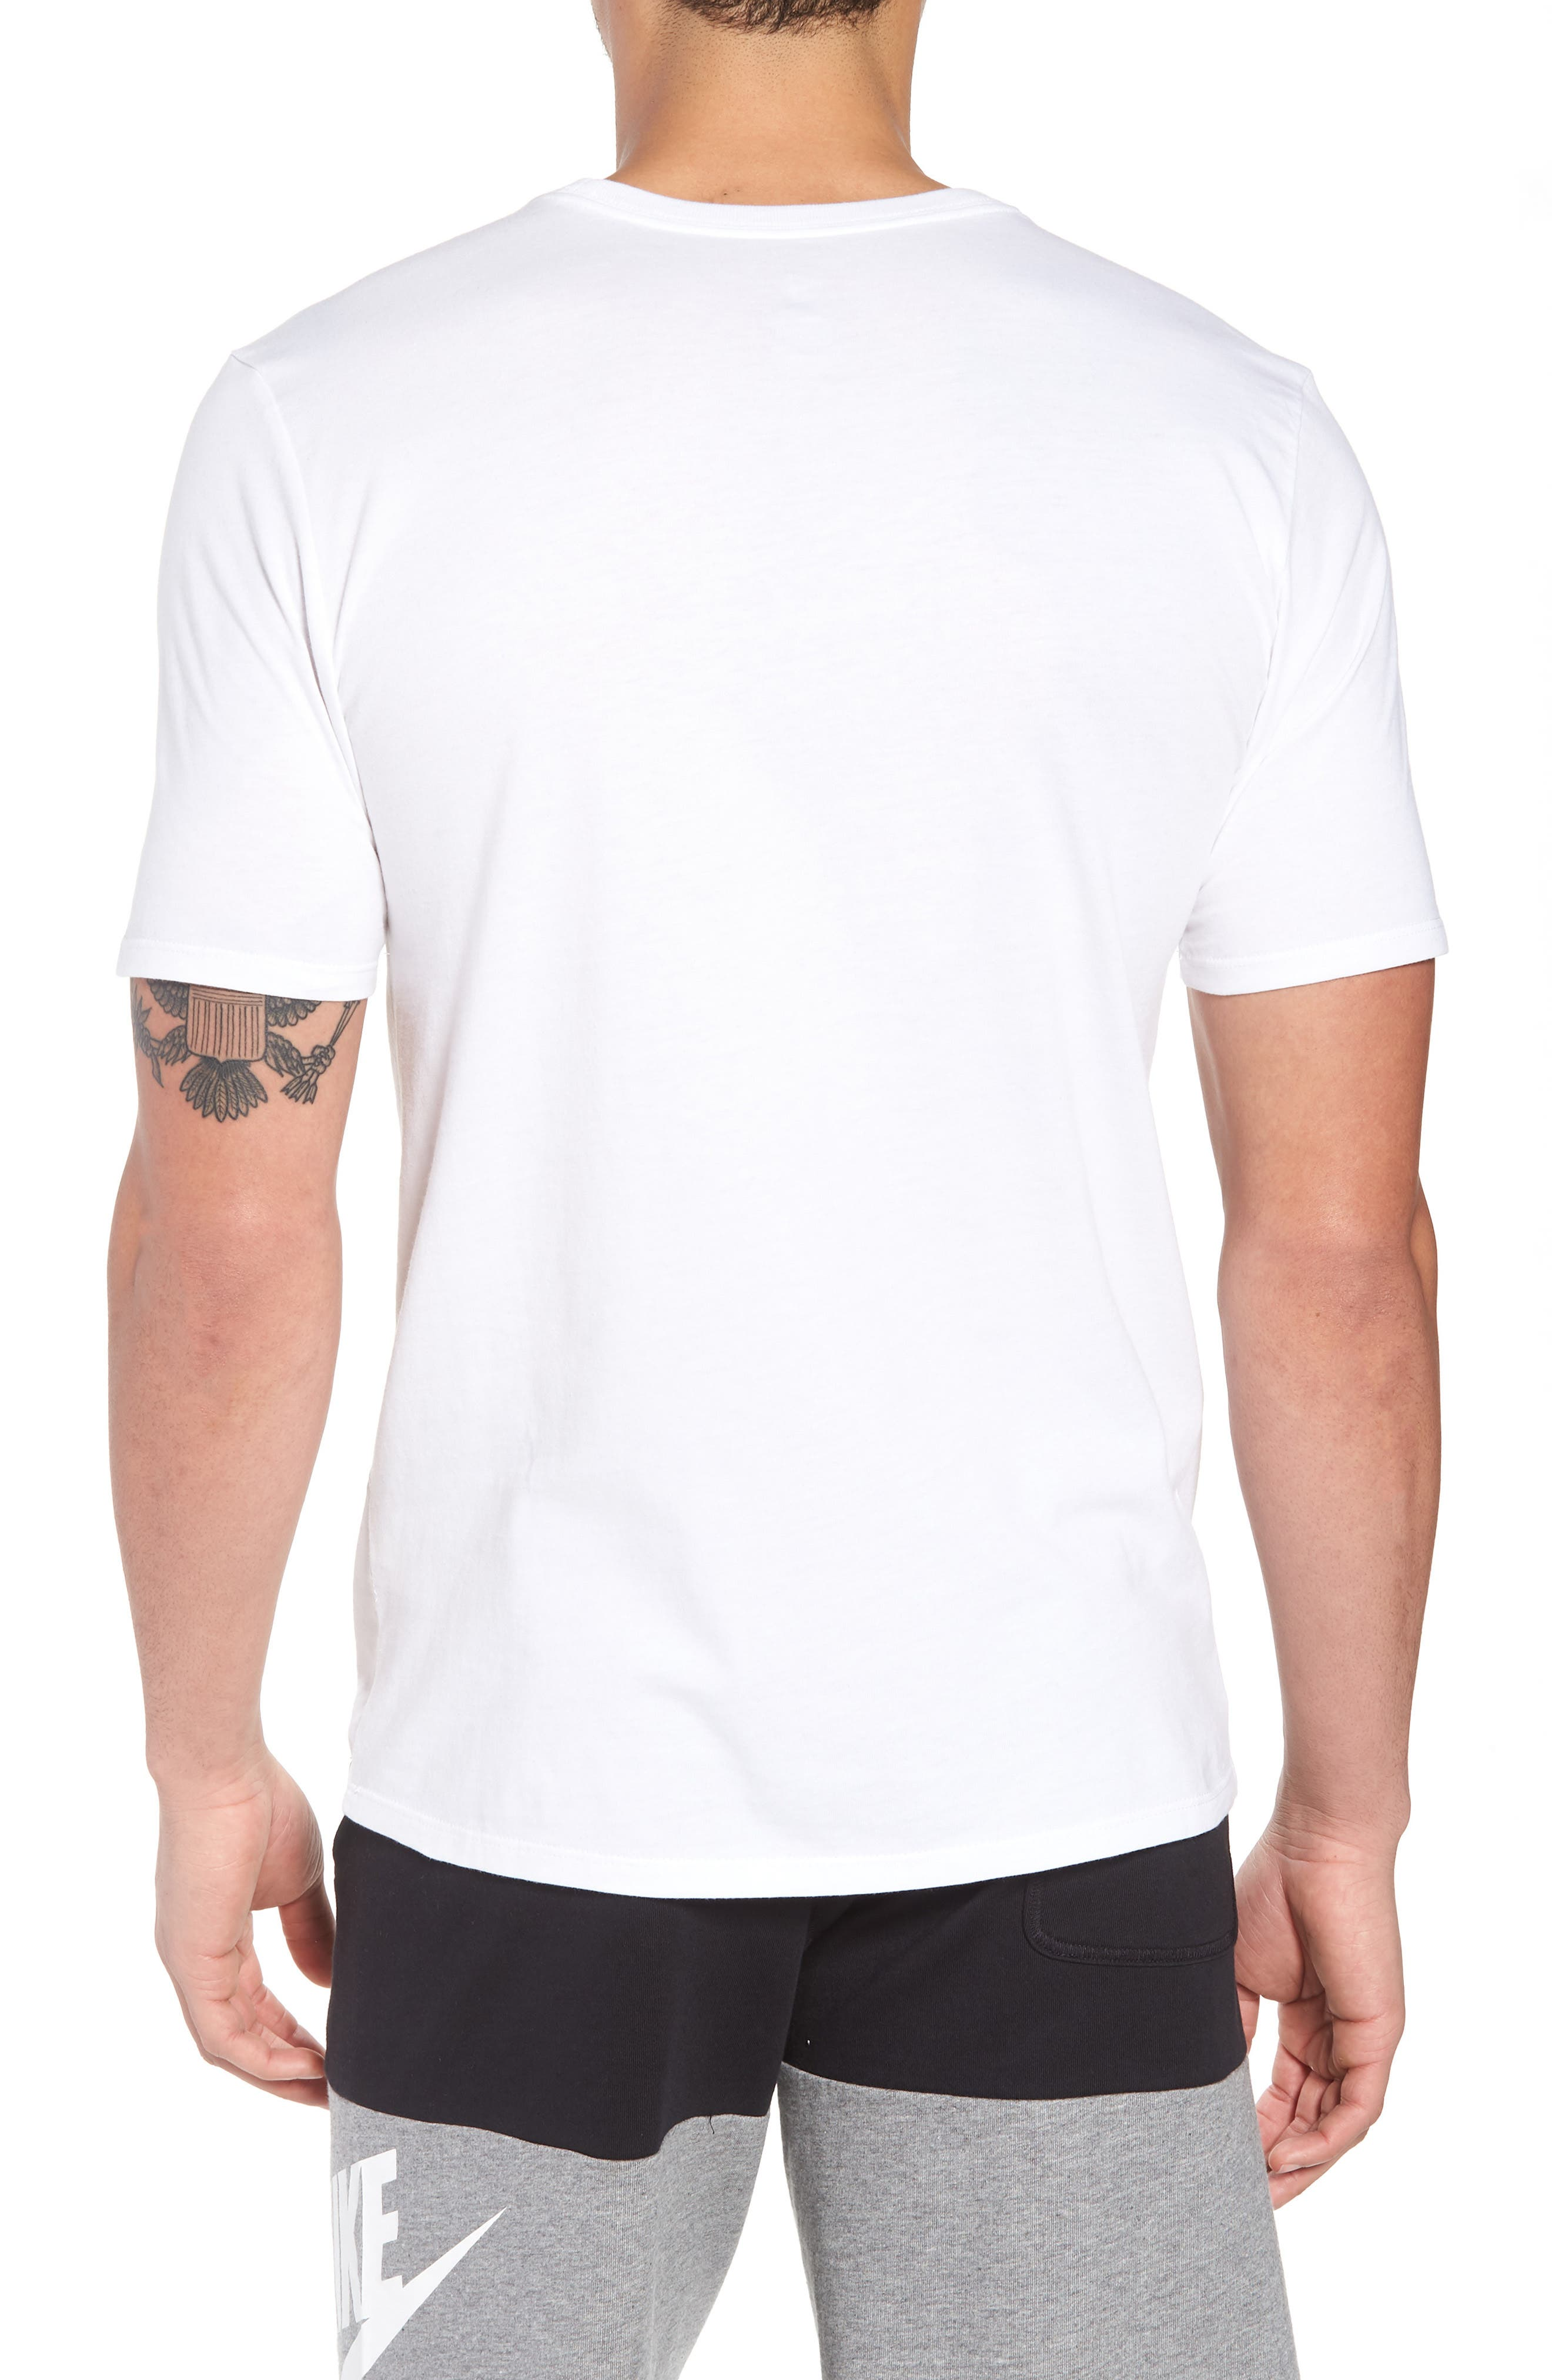 Sportswear City of Flight T-Shirt,                             Alternate thumbnail 5, color,